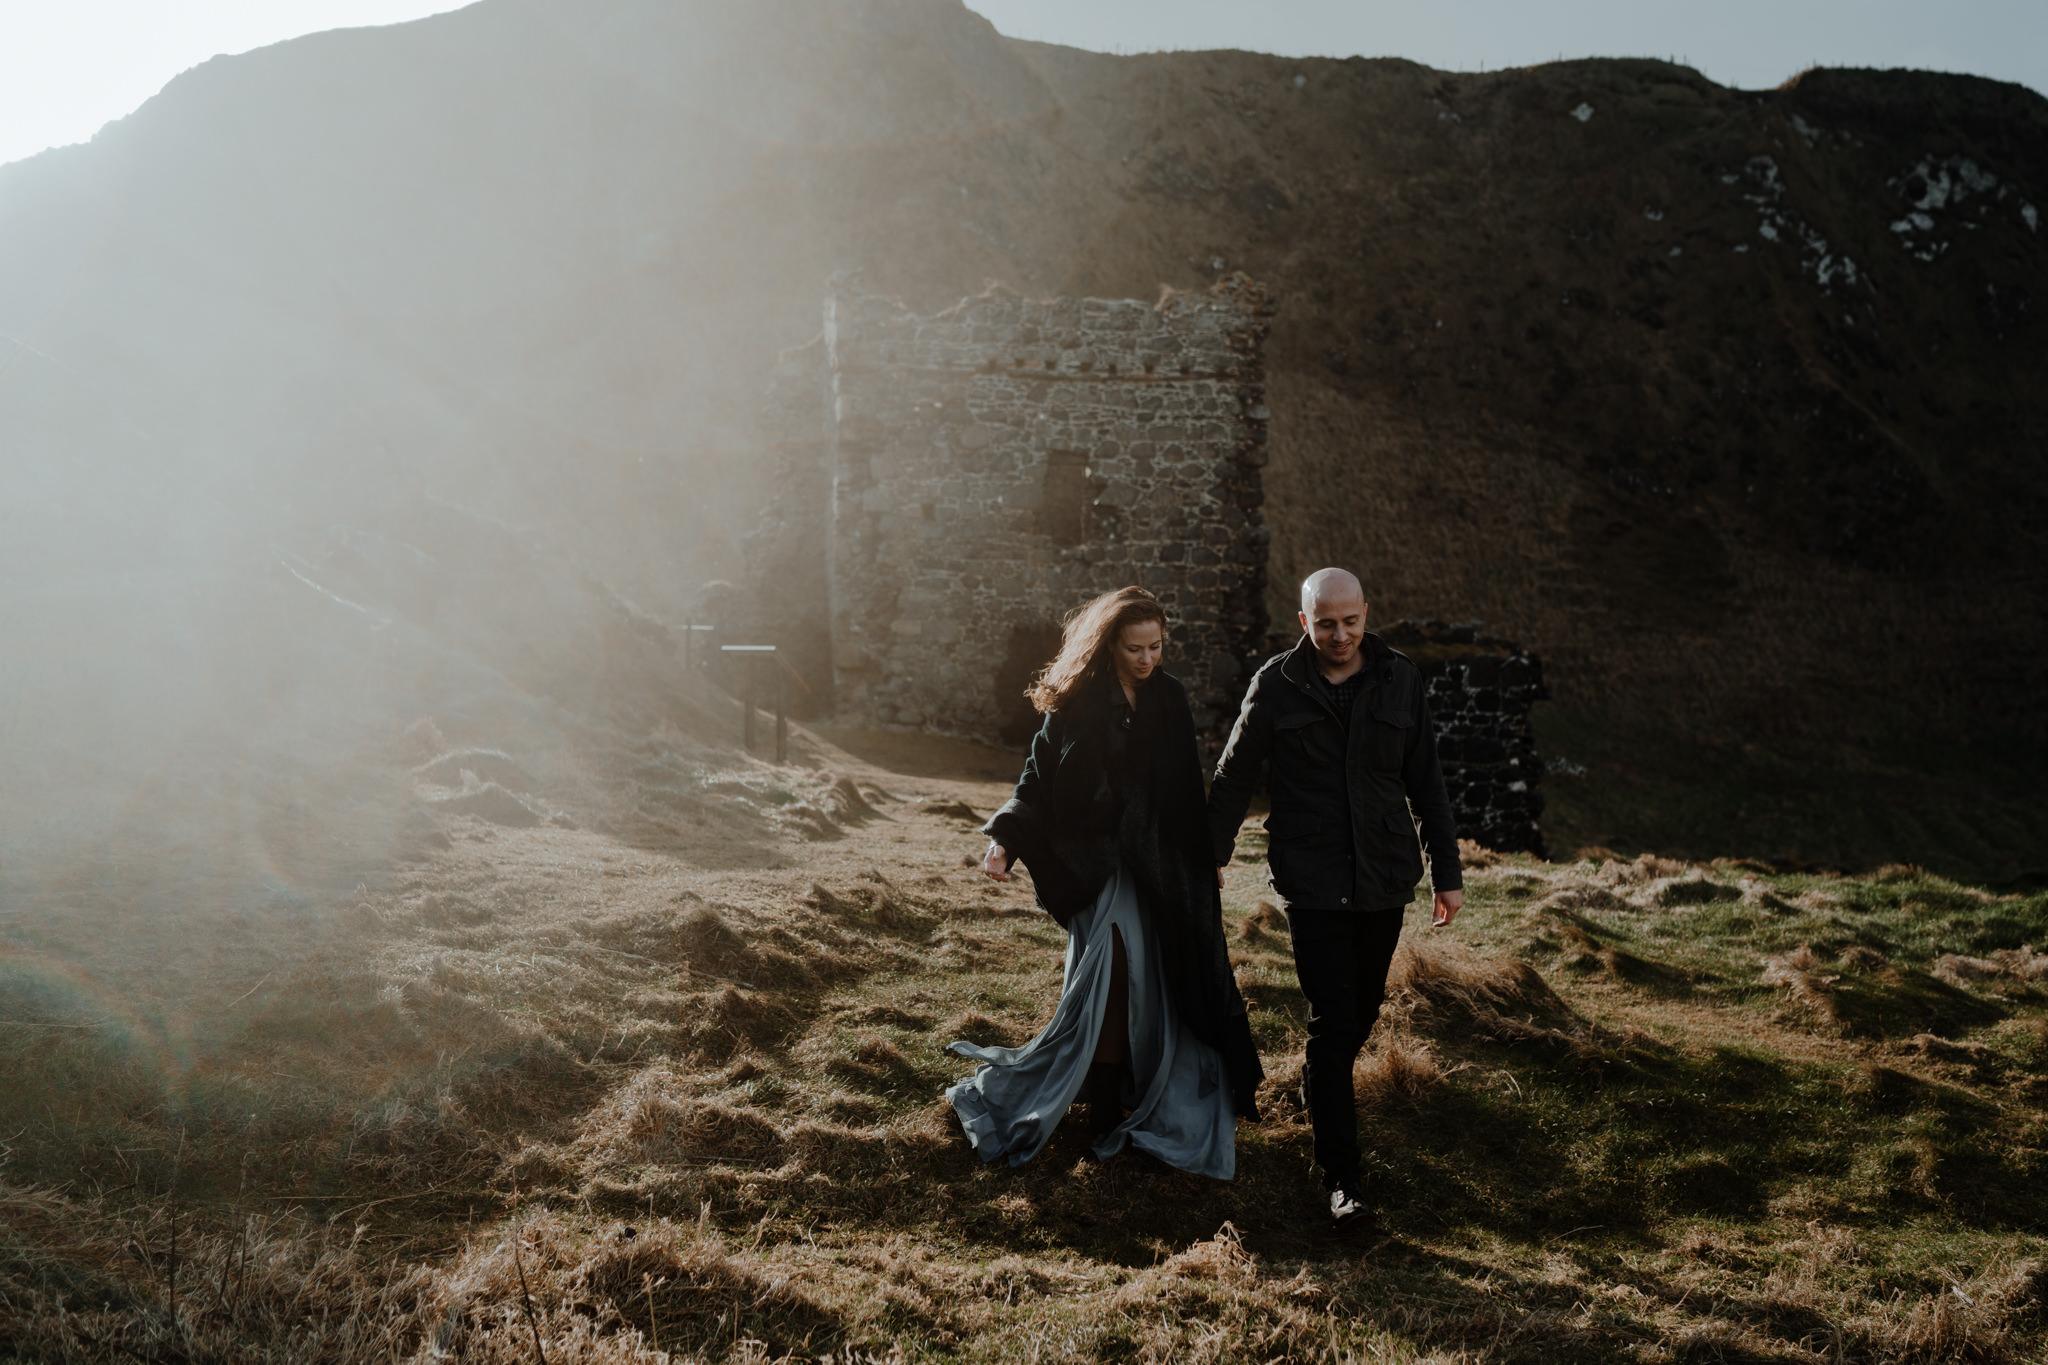 castle ruin elopement location in northern ireland